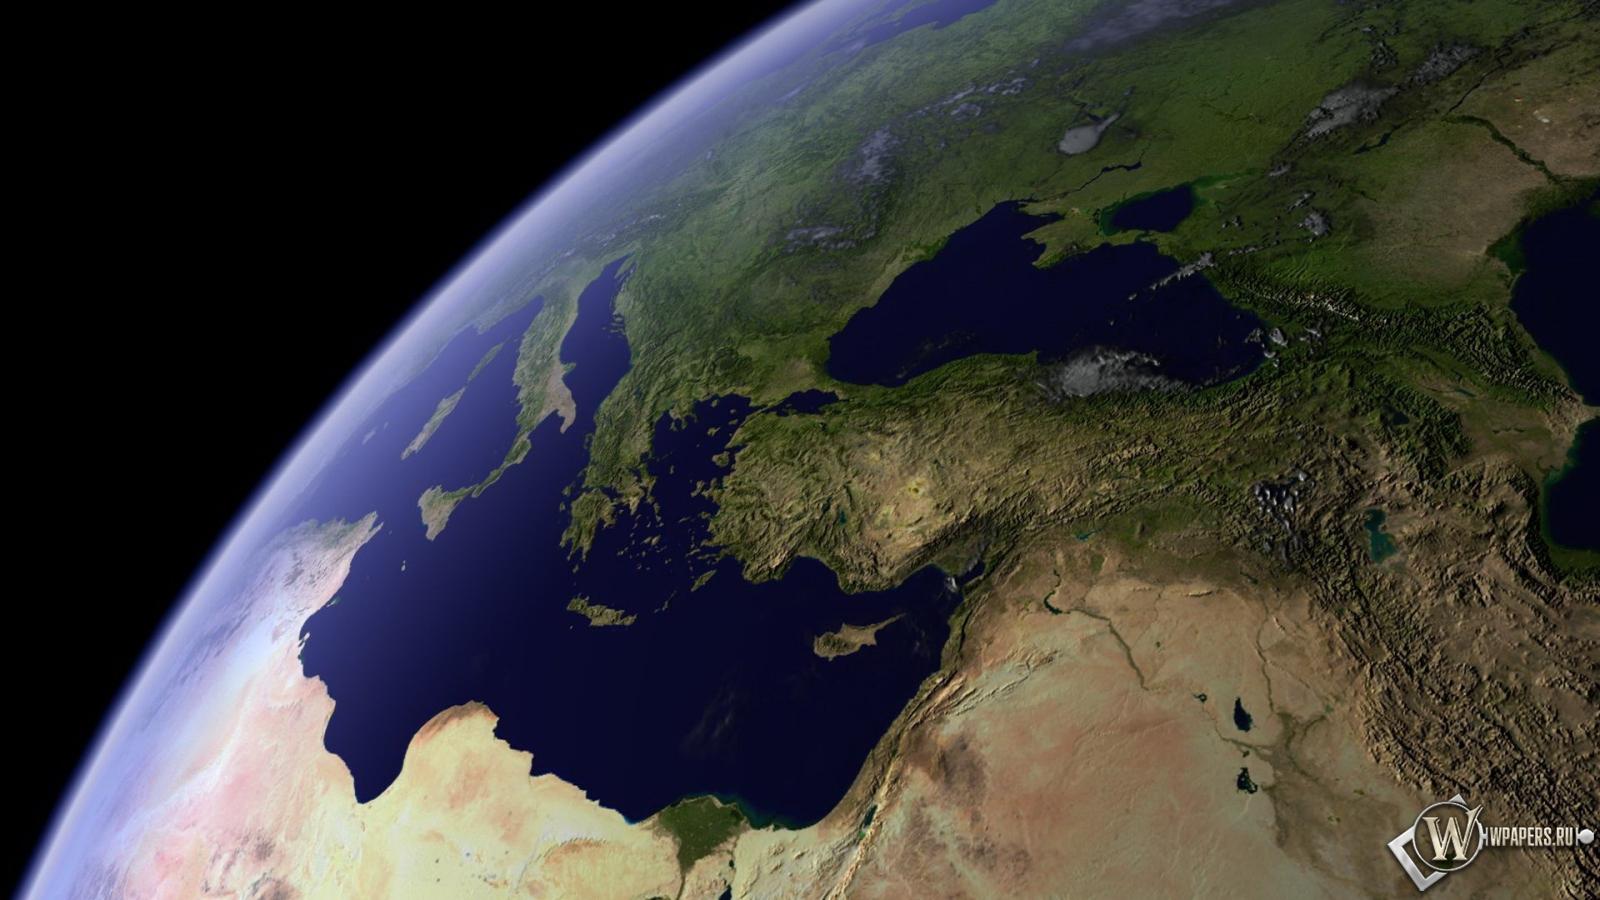 Планета гугл земля онлайн смотреть - a2507